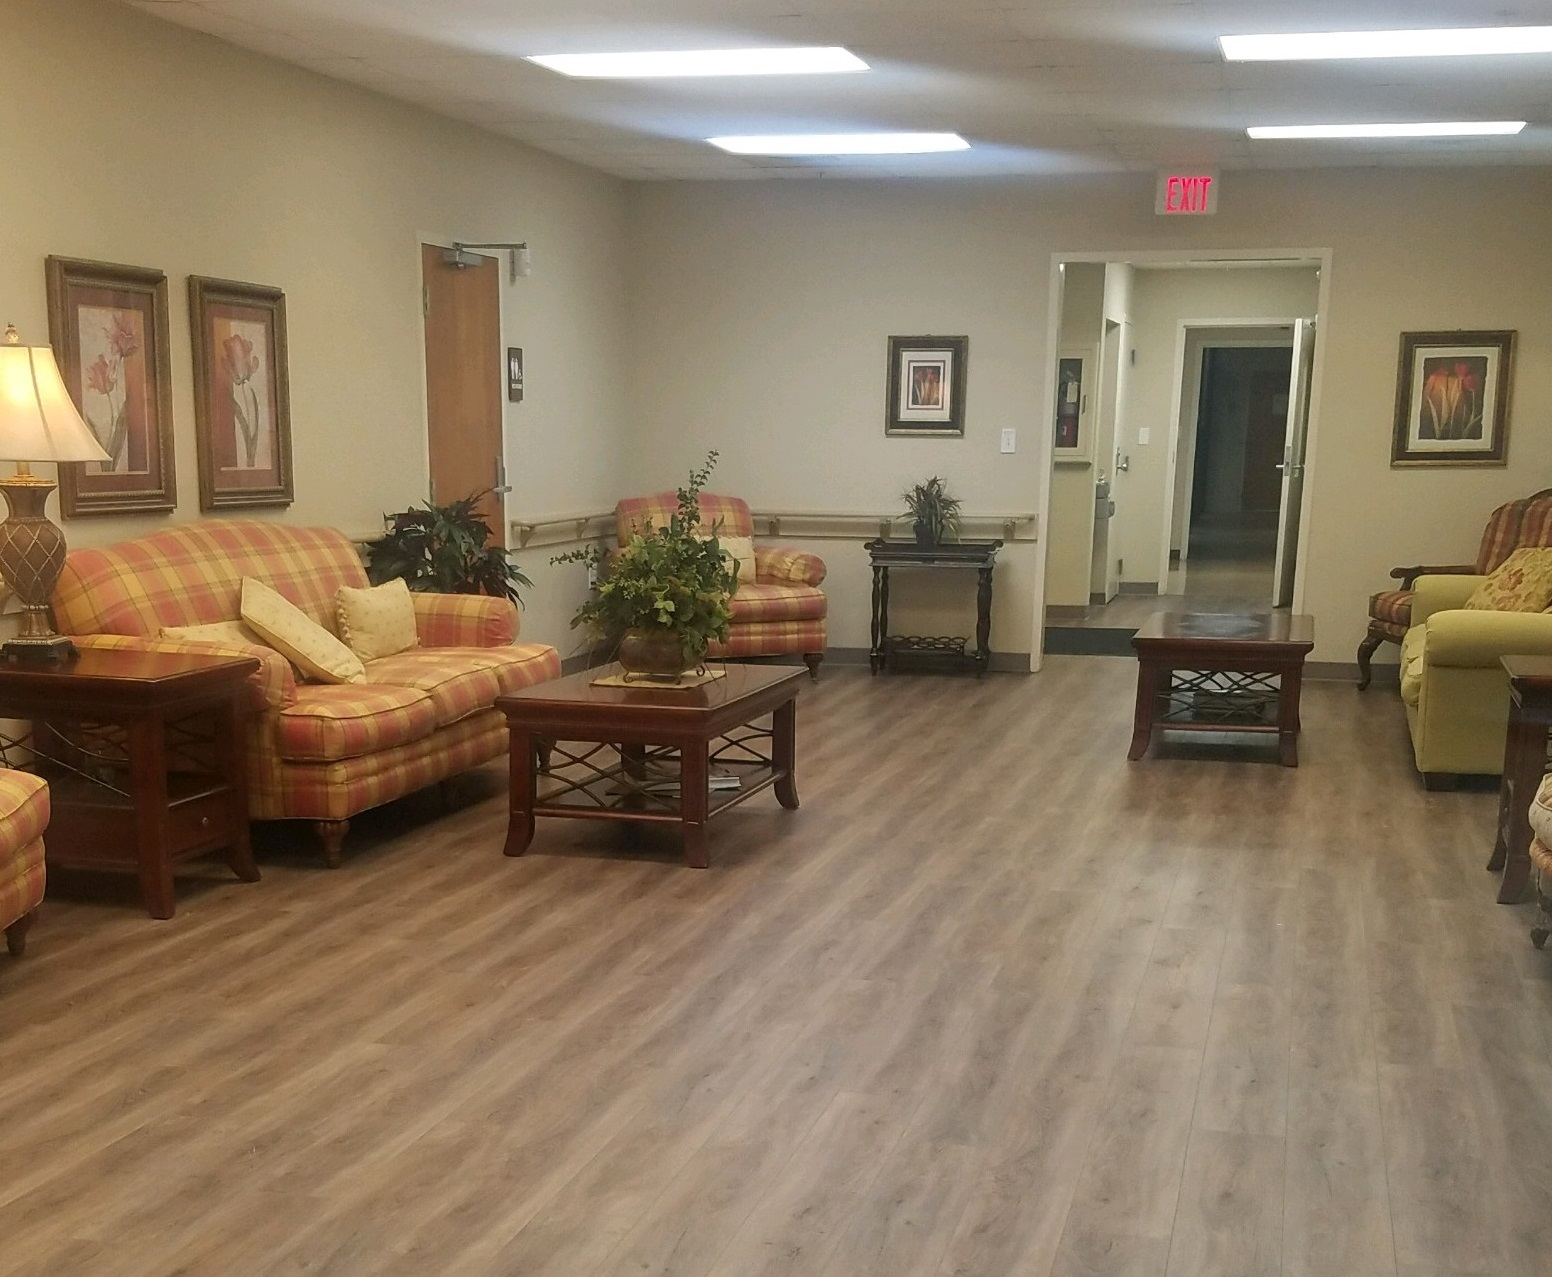 Casey - activity room